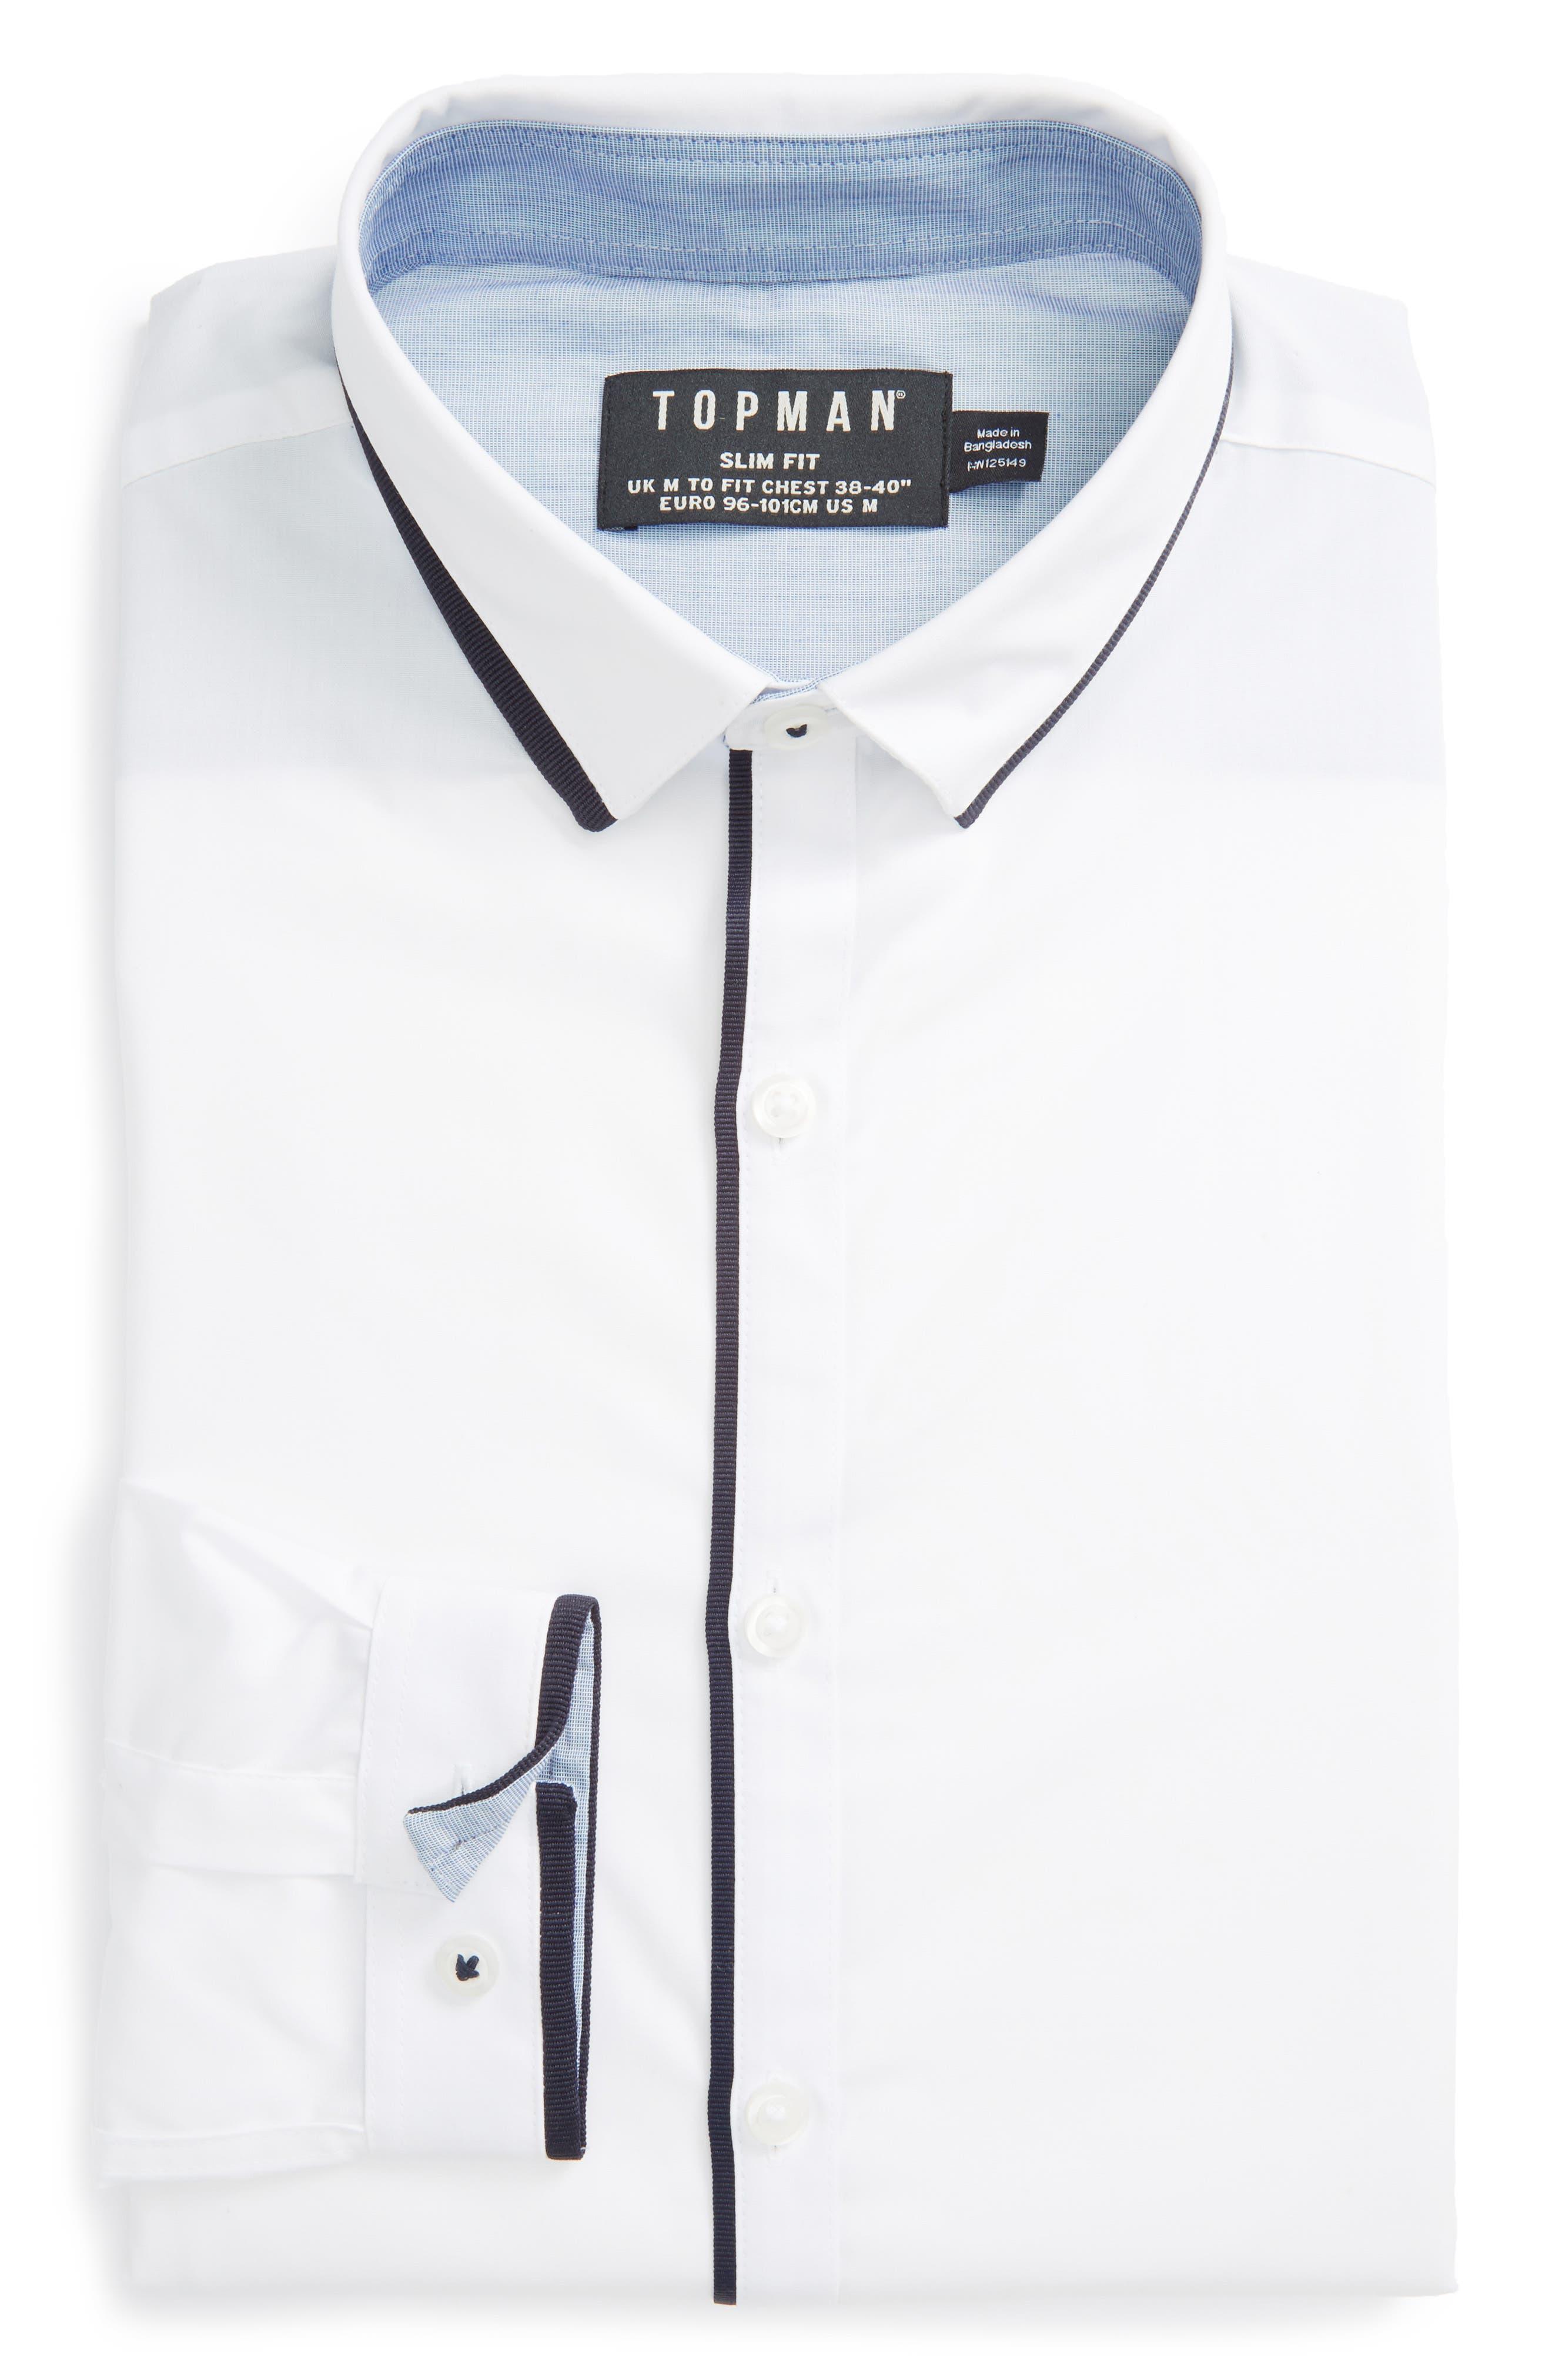 Topman White Contrast Dress Shirt